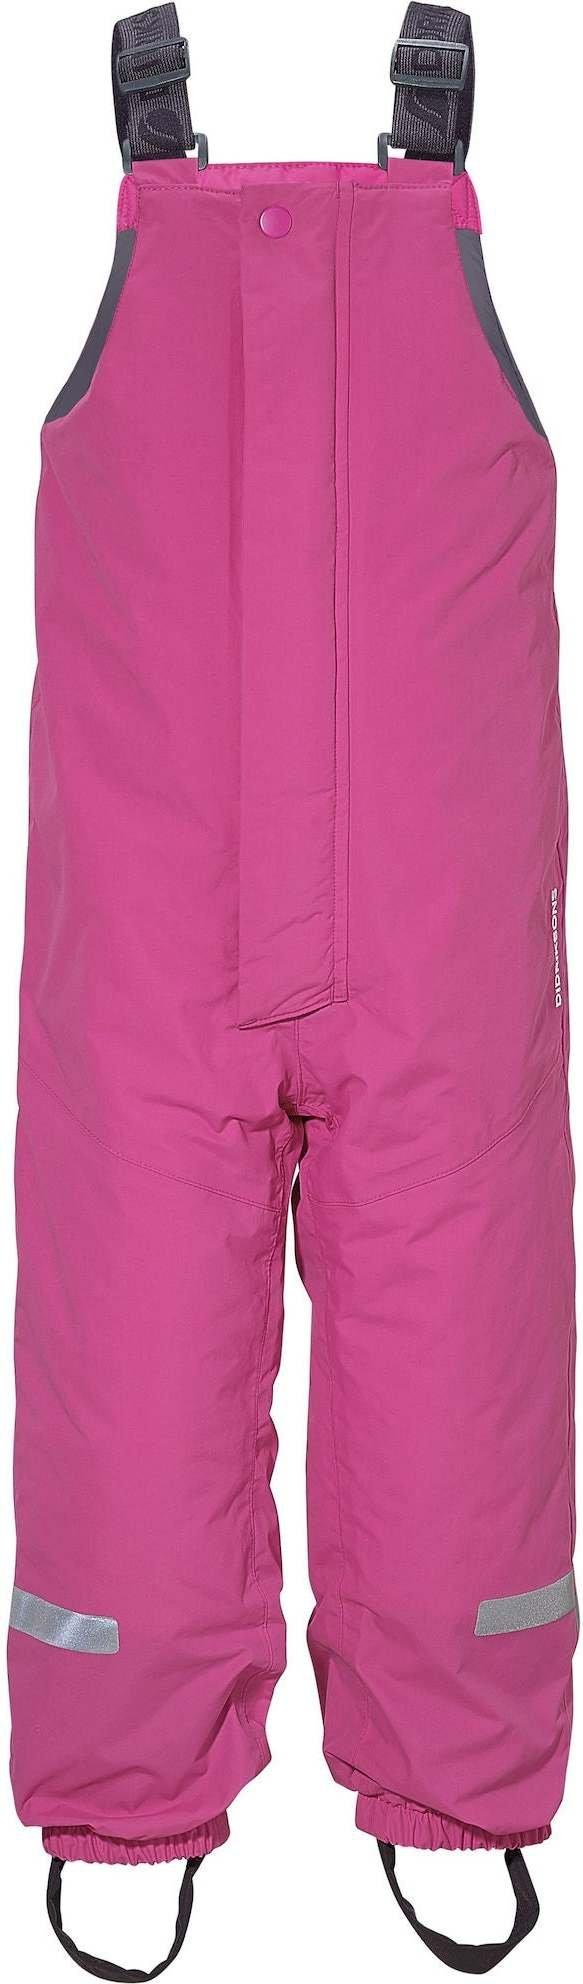 Didriksons Tarfala Bukse Plastic Pink Babyshop.no